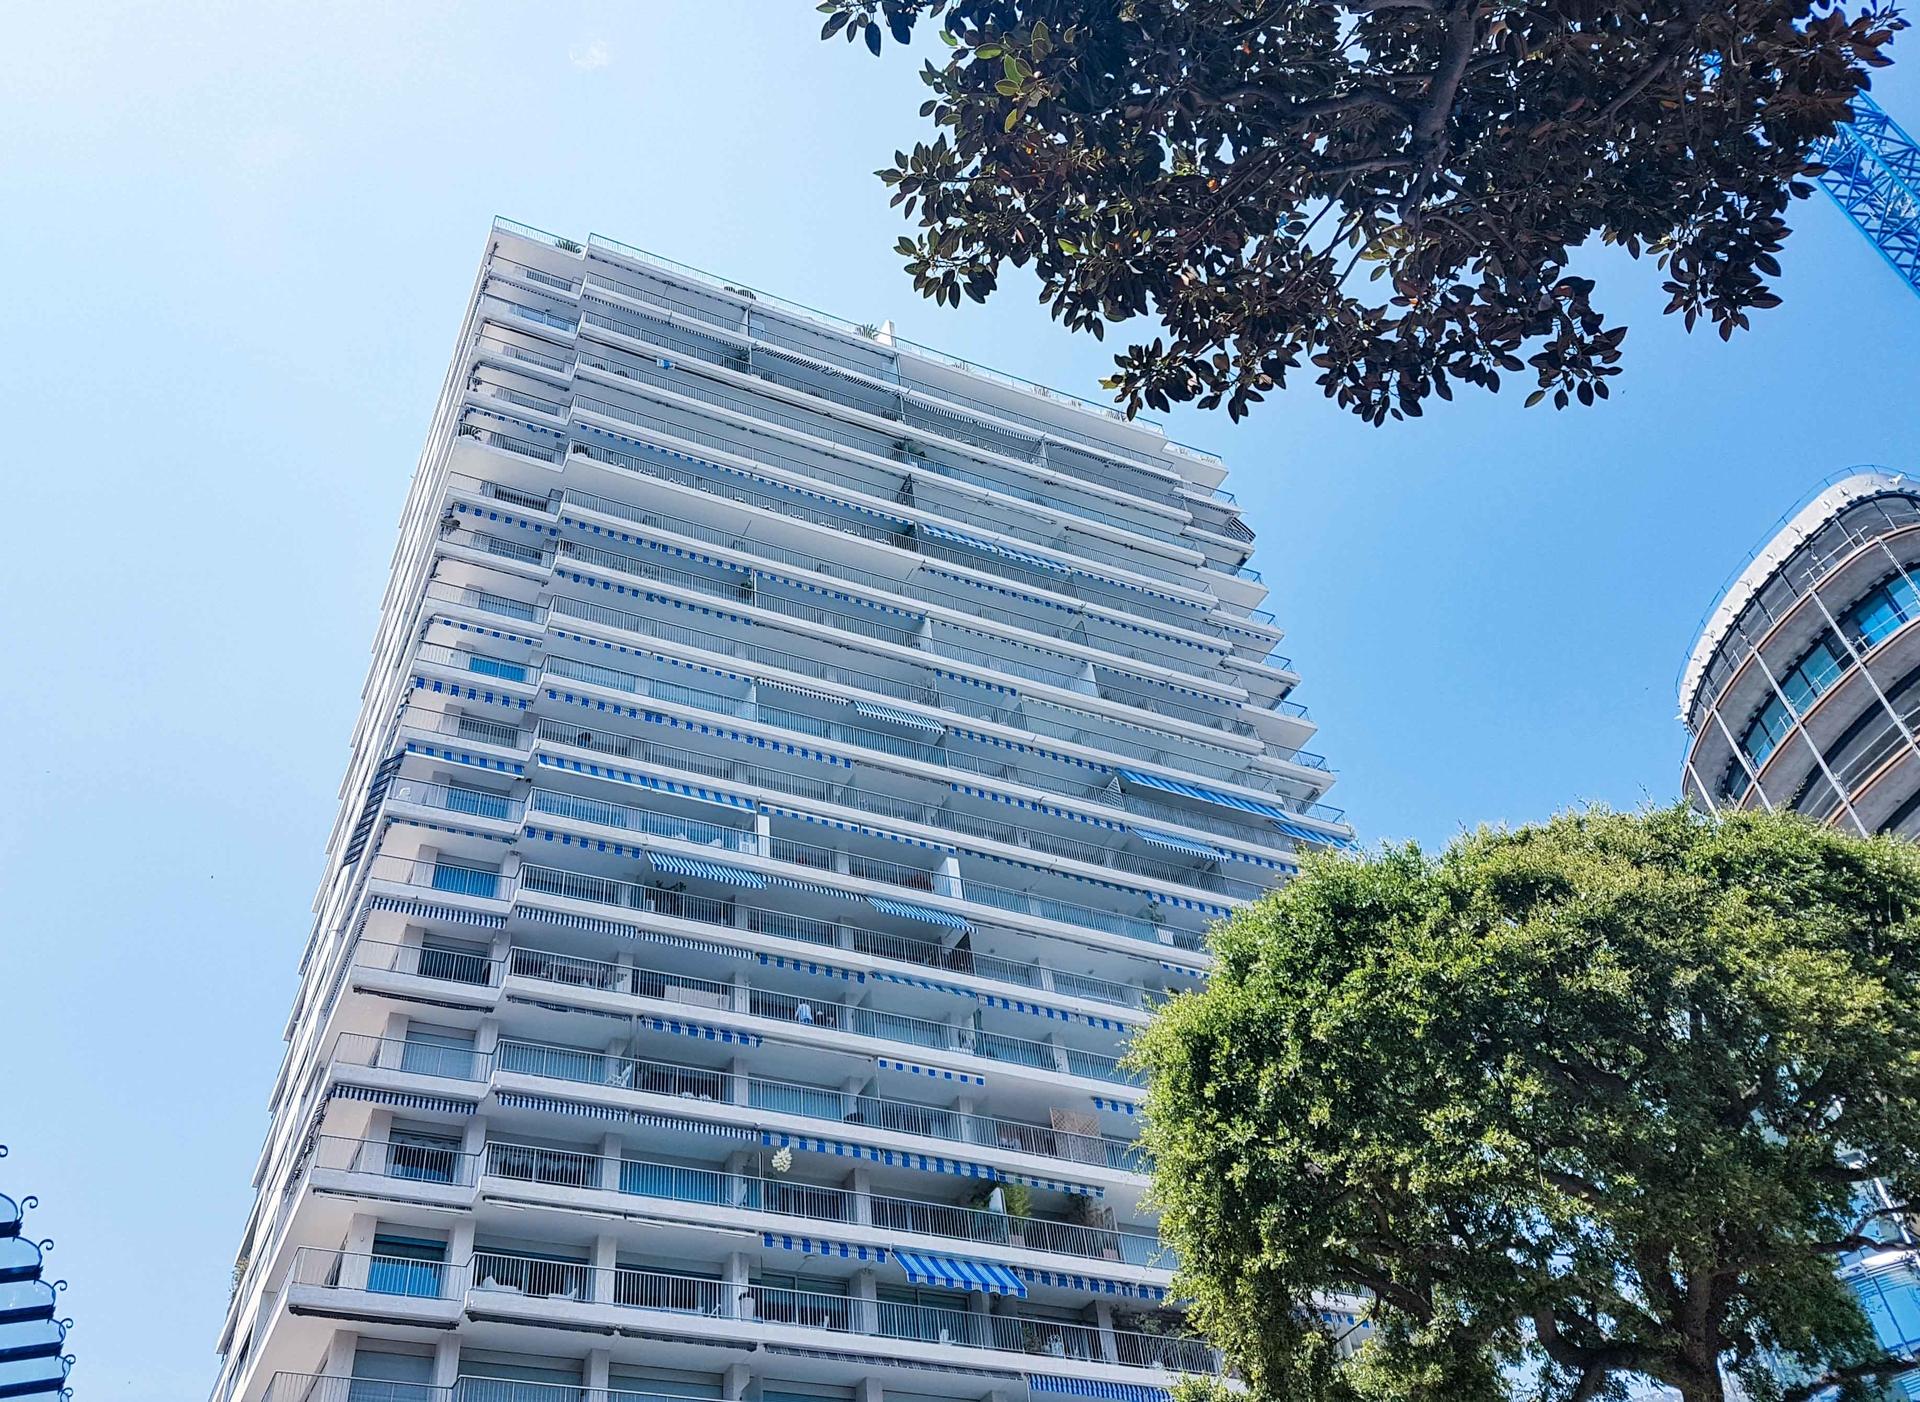 Affitti parking in the sun tower monaco monte carlo for Garage millo nice